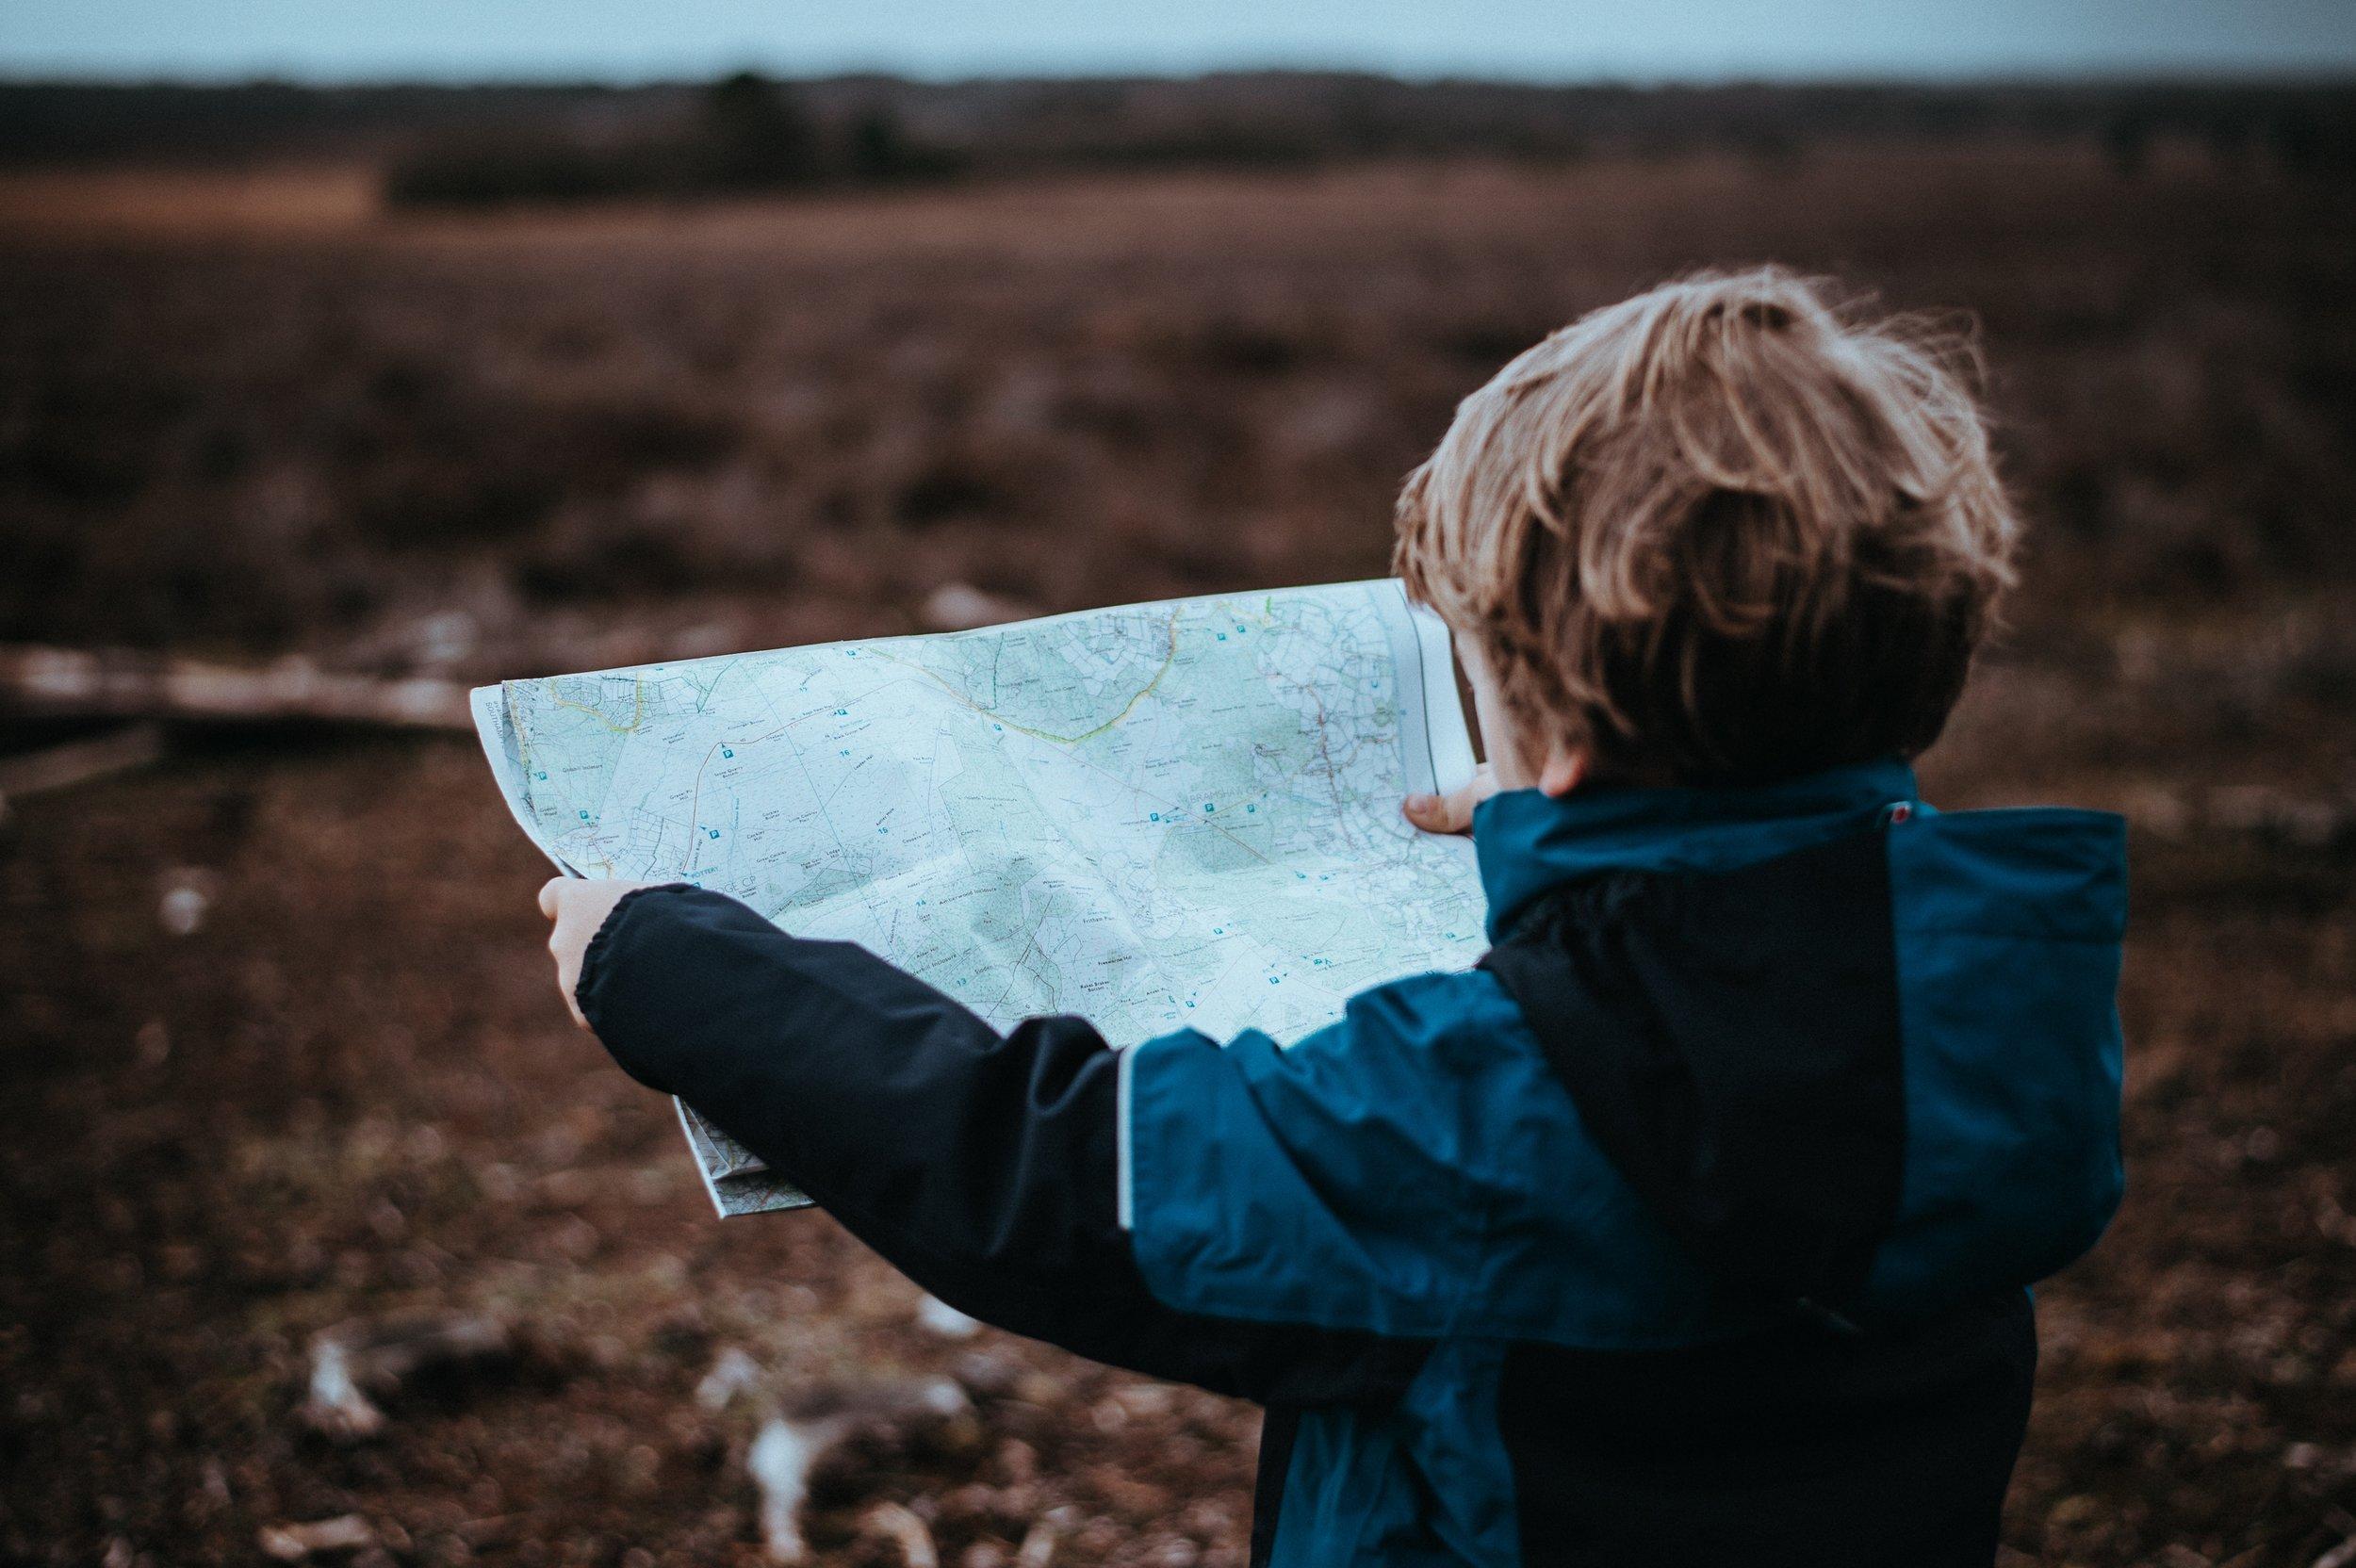 Boy holding map